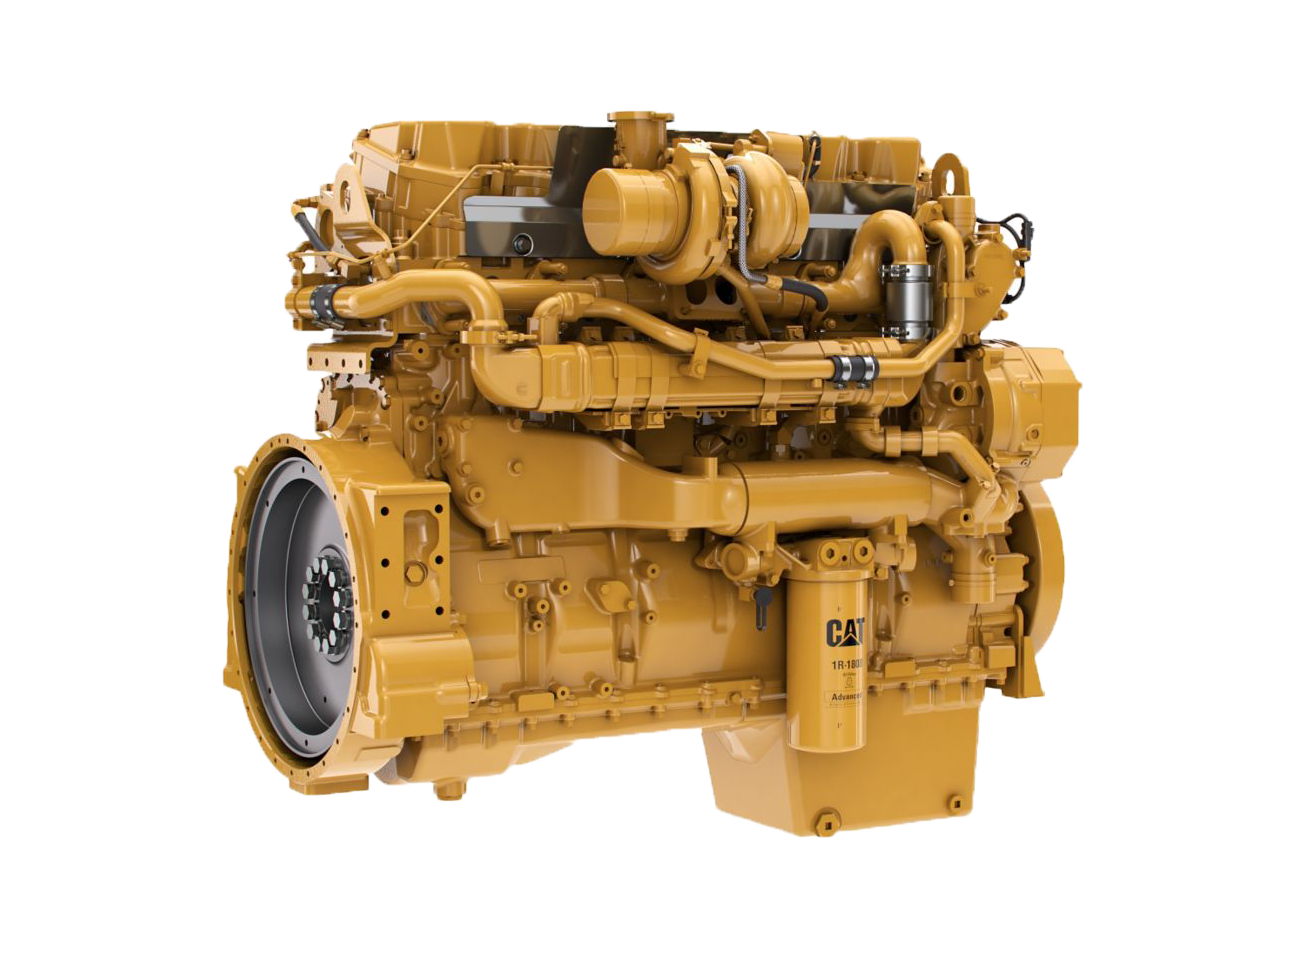 Chiptuning Caterpillar 3126E 7.2 - 335 PK - 1167 Nm